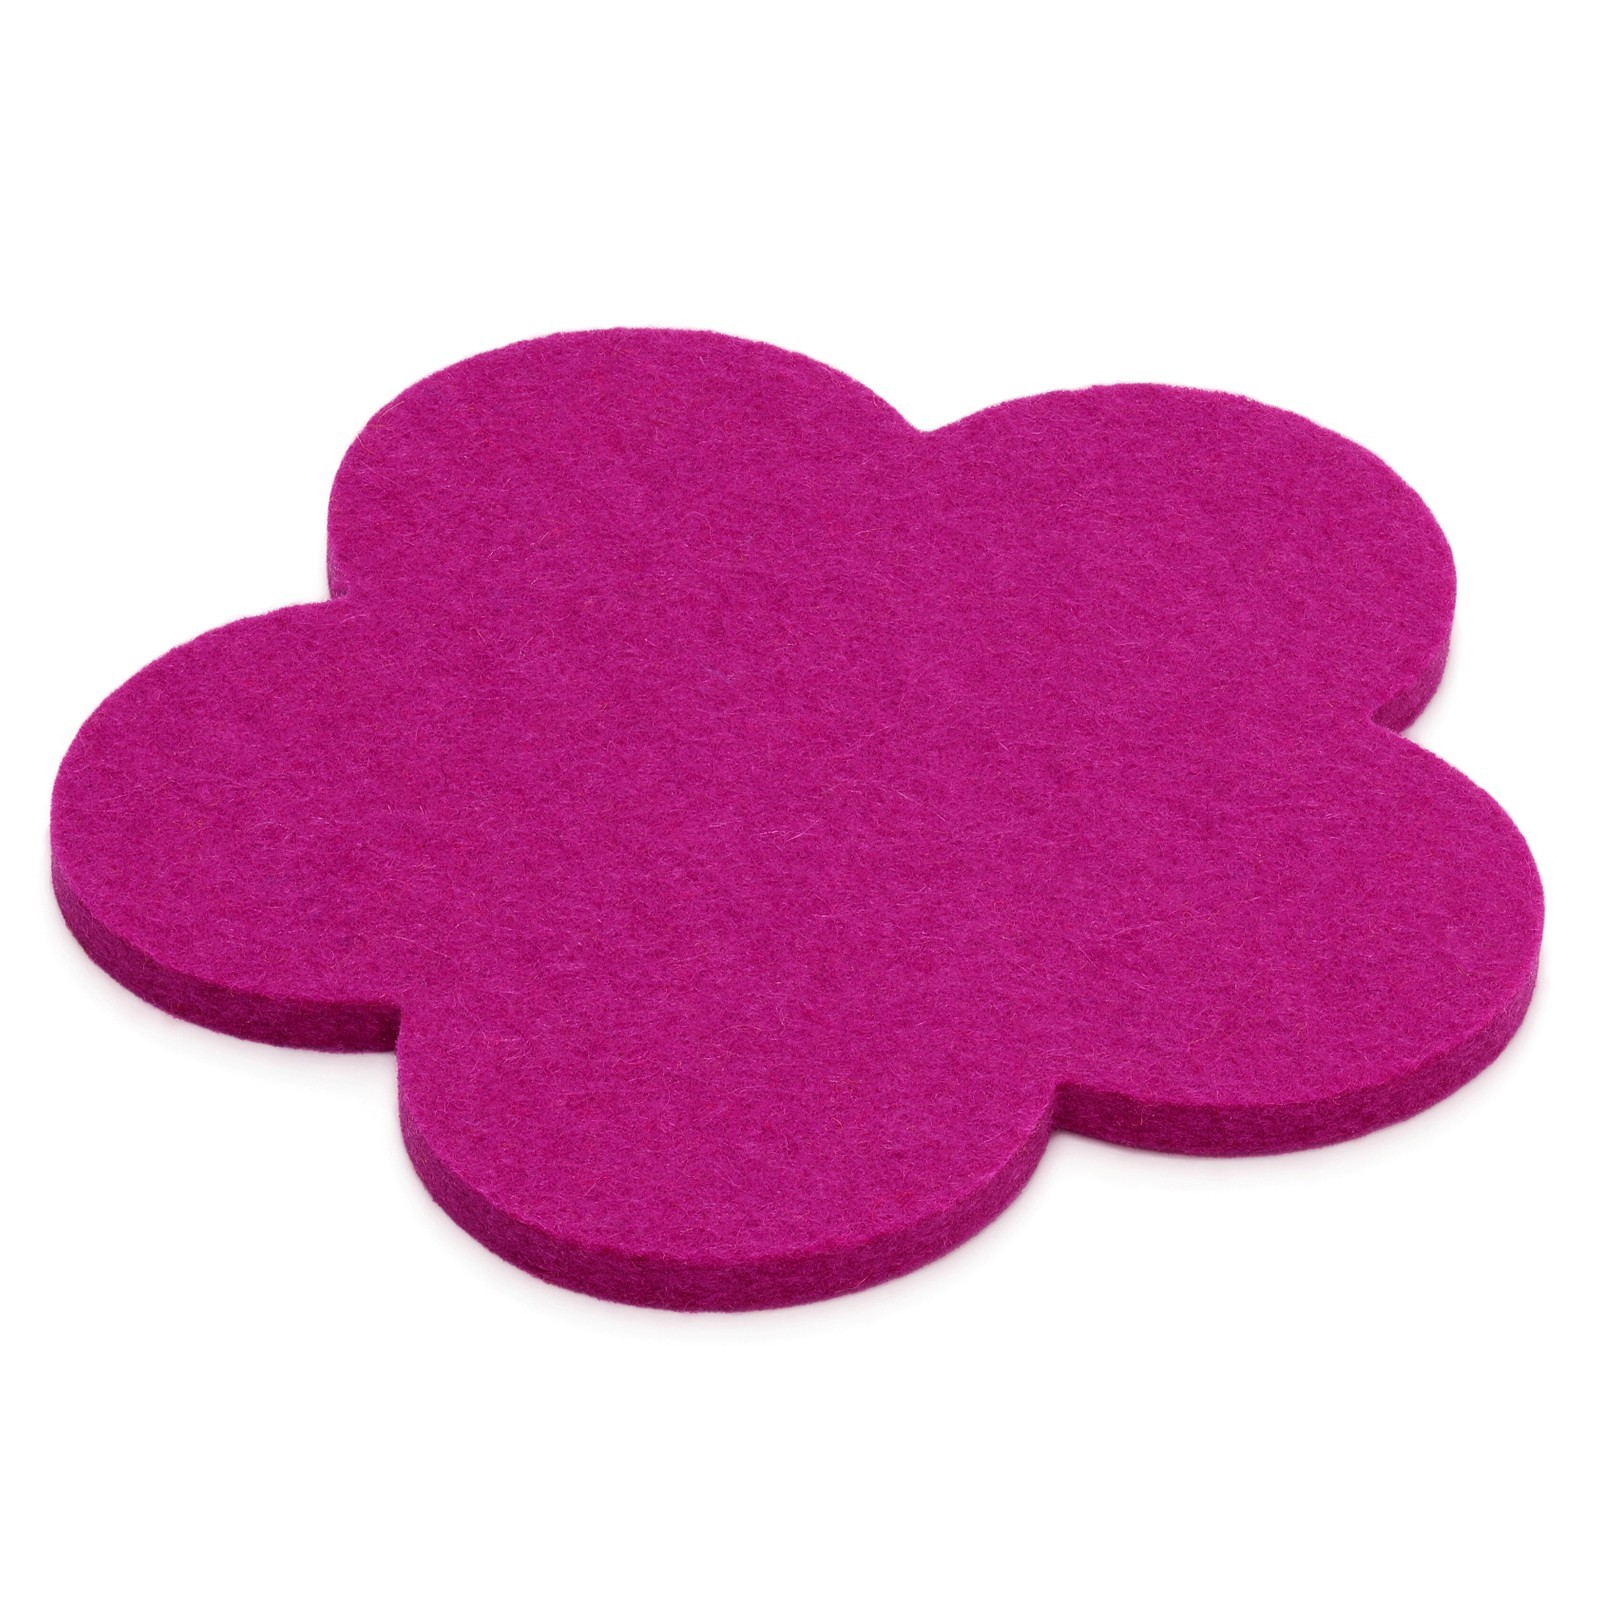 untersetzer bl tenform 3 mm filz 12 teilig viele farben. Black Bedroom Furniture Sets. Home Design Ideas